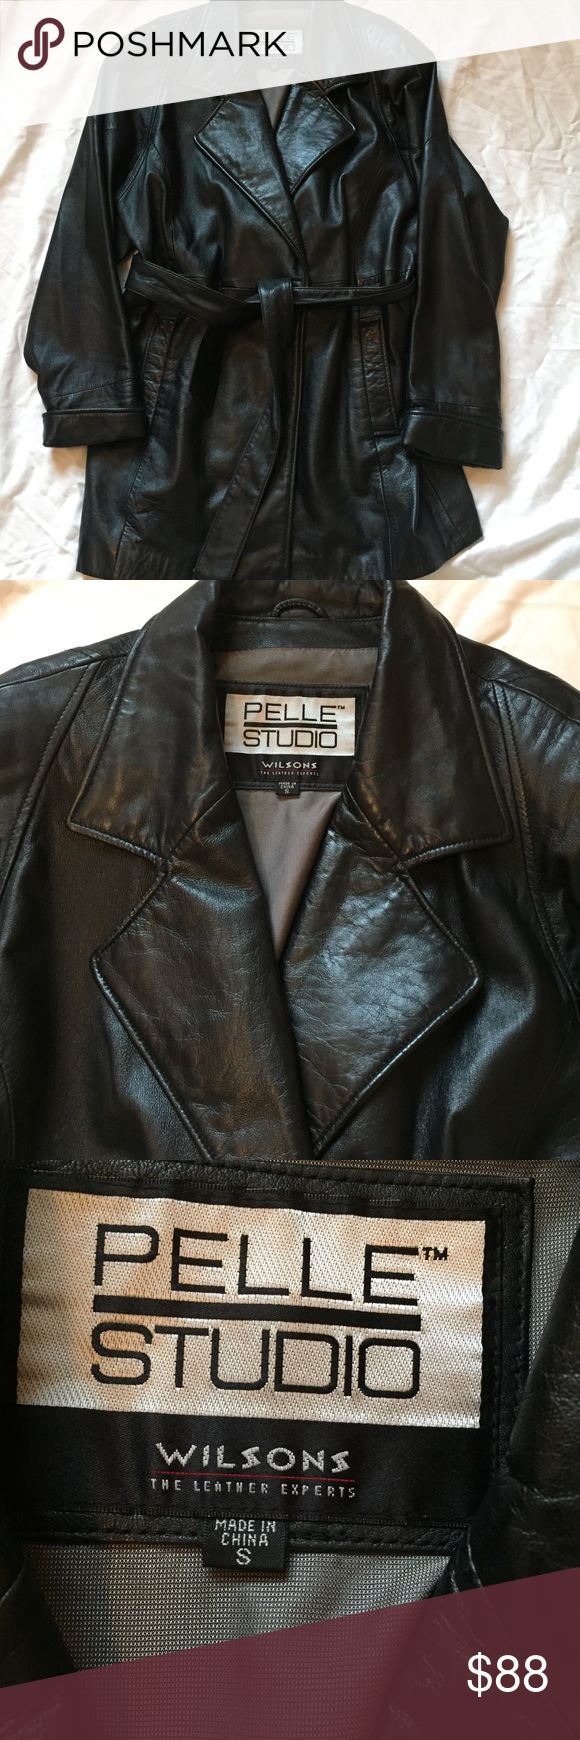 Wilson Leathwe Pelle Studio Jacket Black leather trench